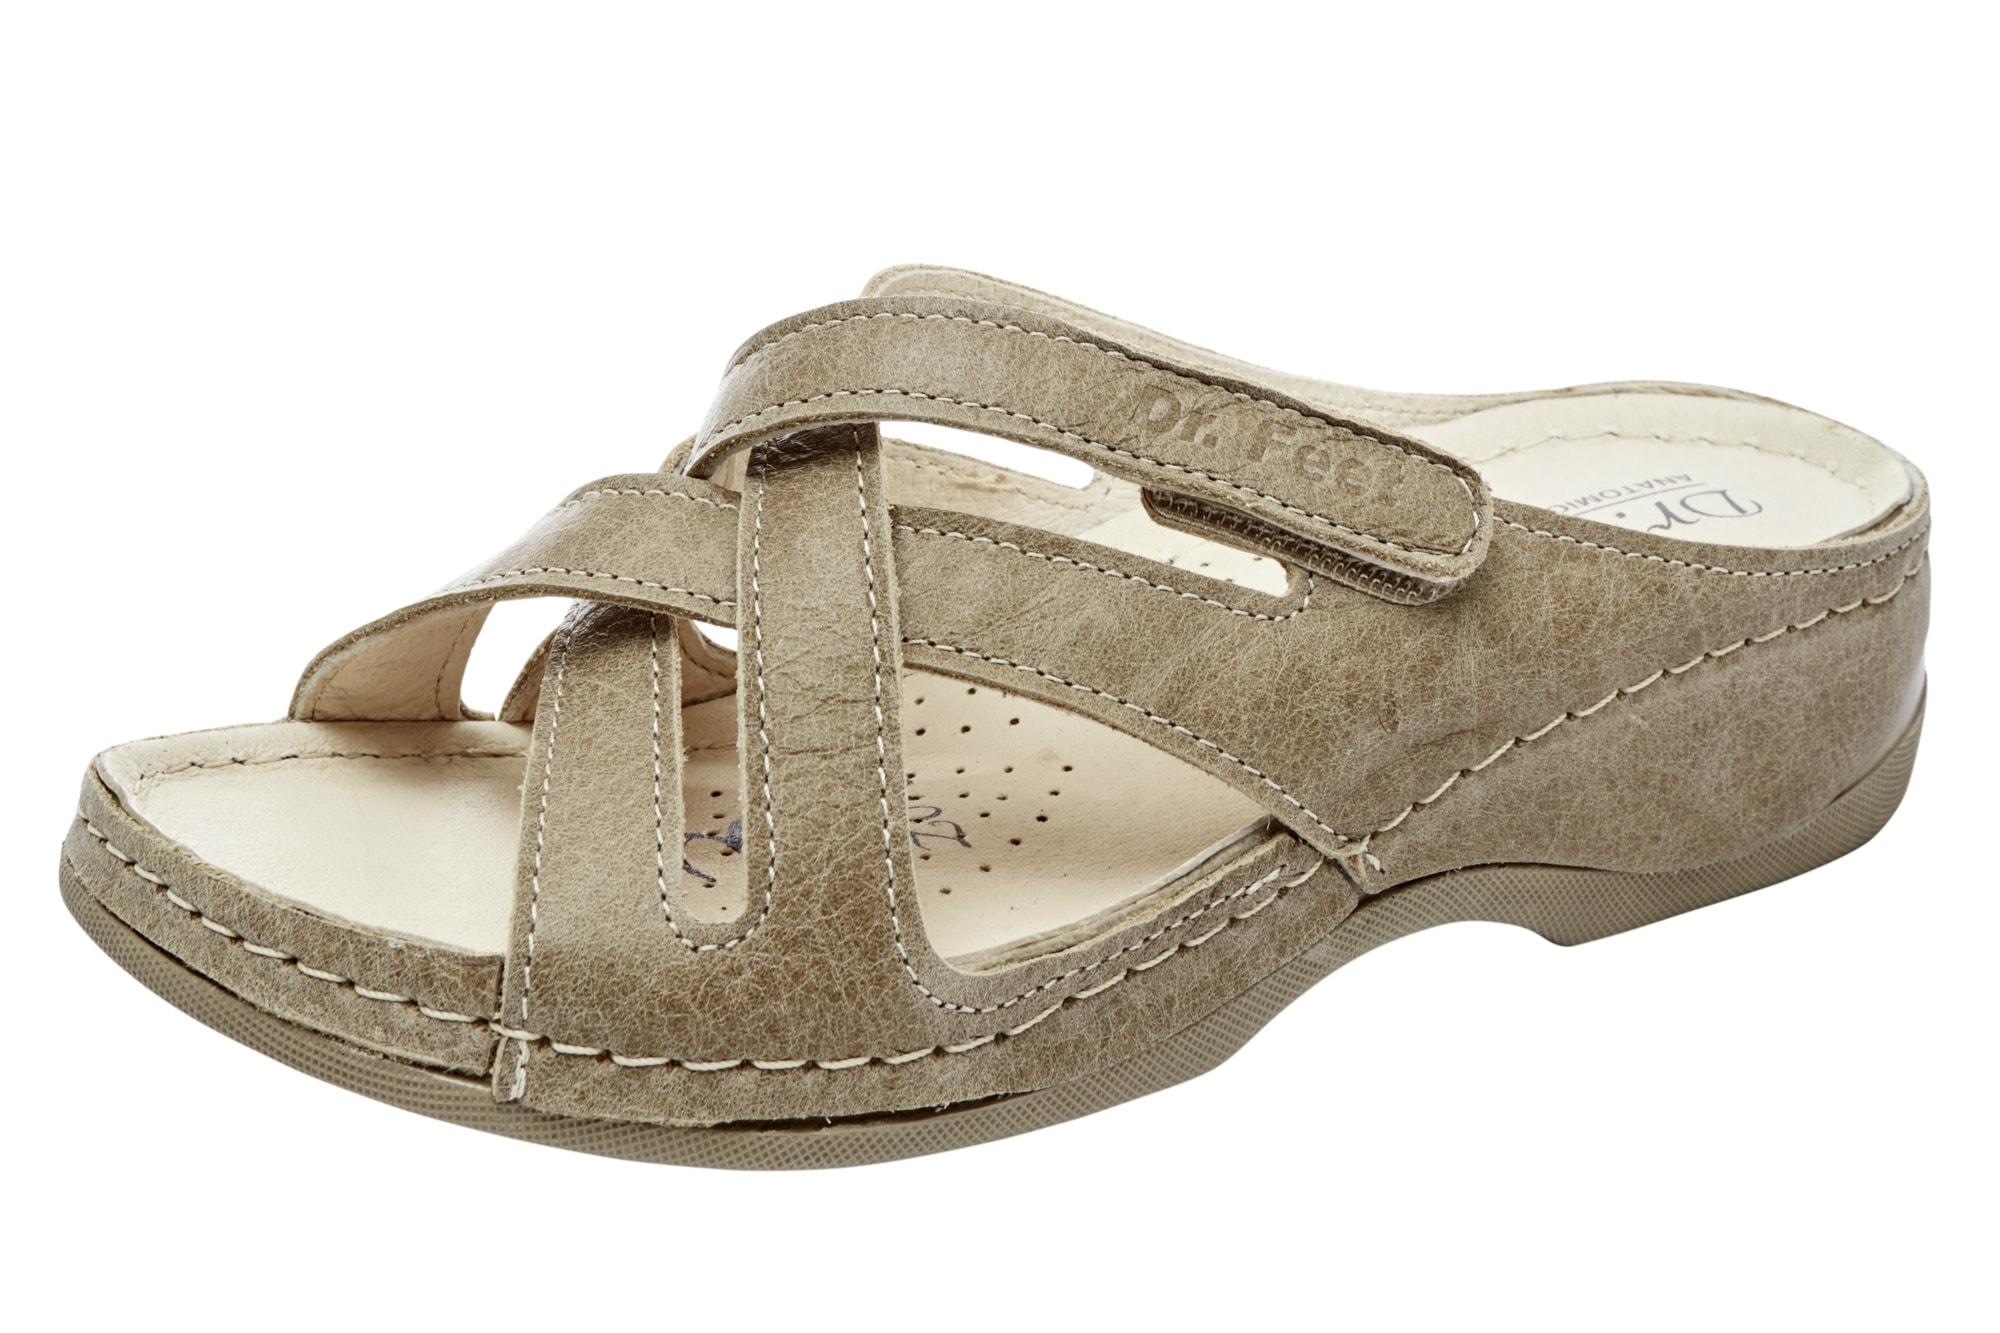 heine home Hausschuhe mit Klettverschluss Damenmode/Schuhe